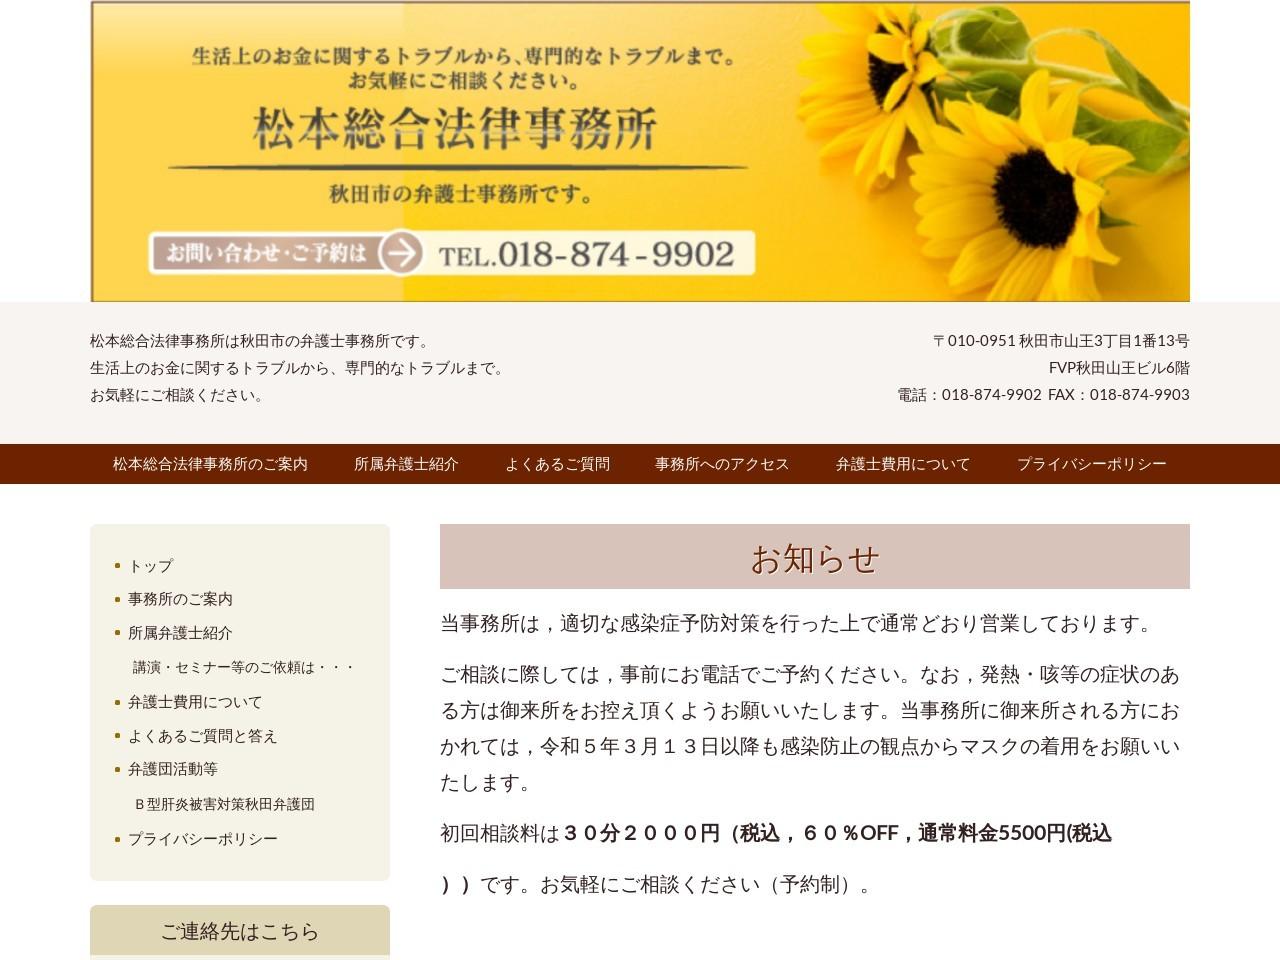 松本総合法律事務所